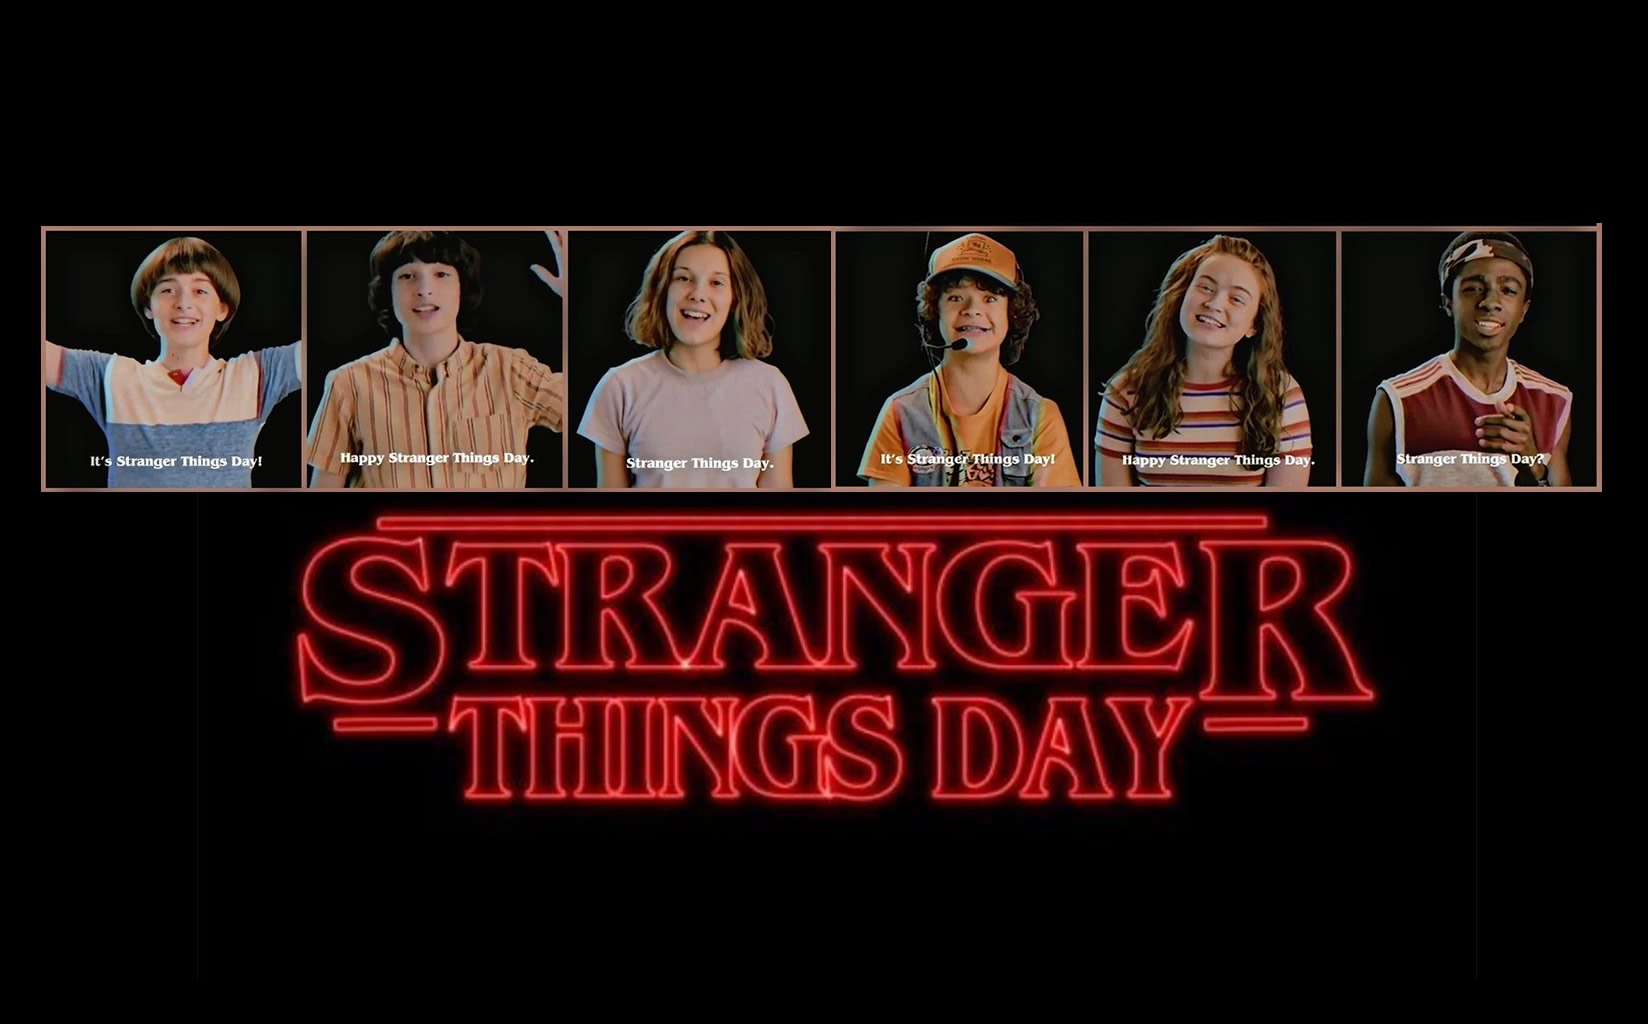 Stranger Things Day - Netflix declara dia 6 de Novembro como dia de Stranger Things com fotos de bastidores